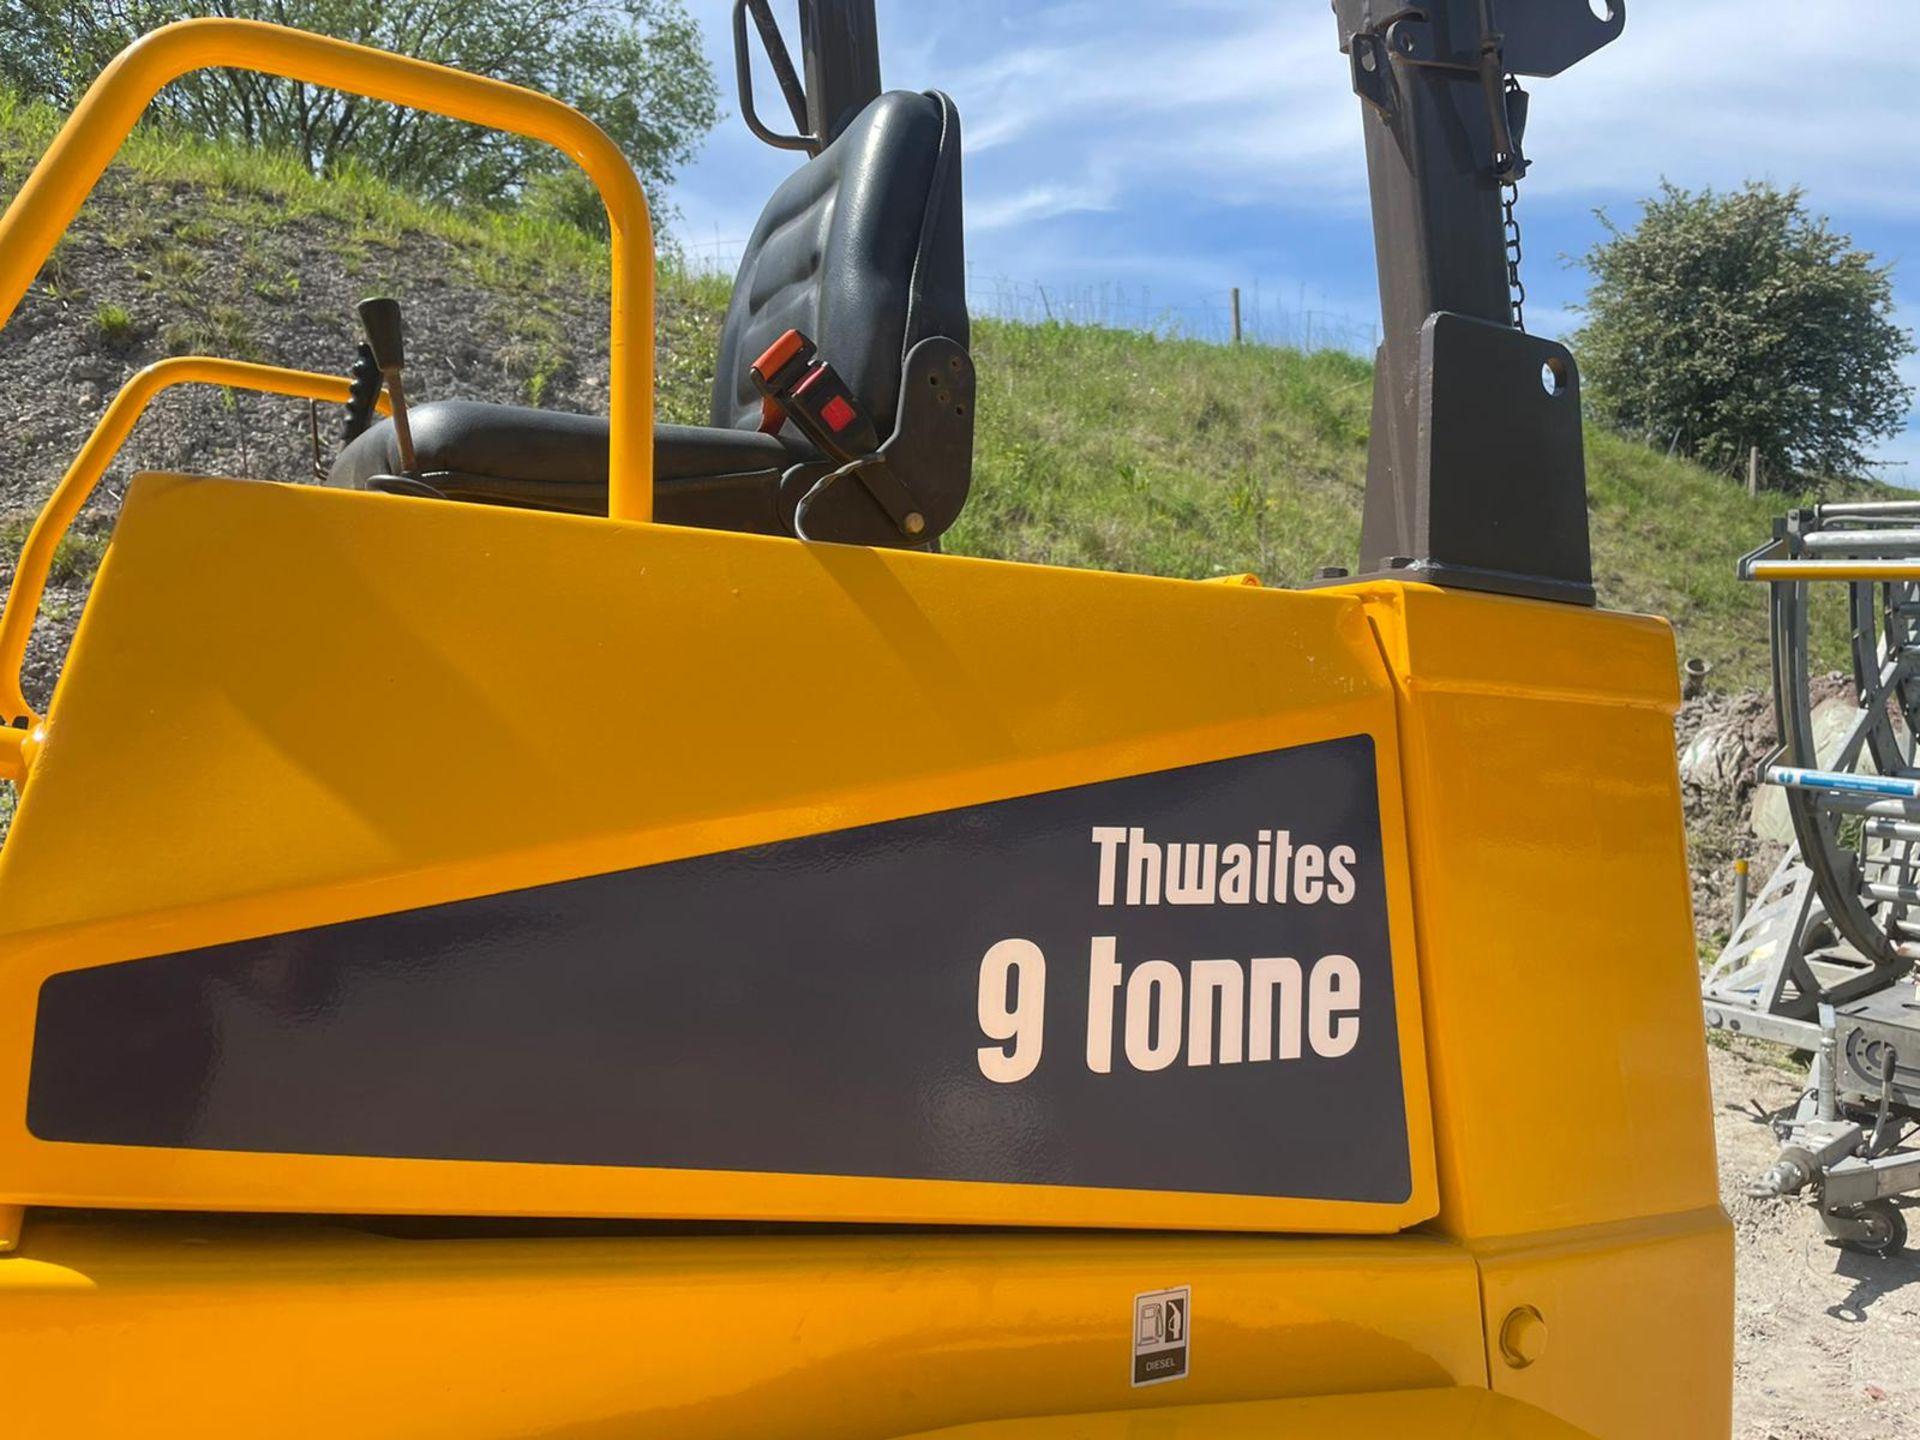 2014 THWAITES 9 TON STRAIGHT TIP DUMPER, 3,104 RECORDED HOURS, 4 WHEEL DRIVE *PLUS VAT* - Image 8 of 10